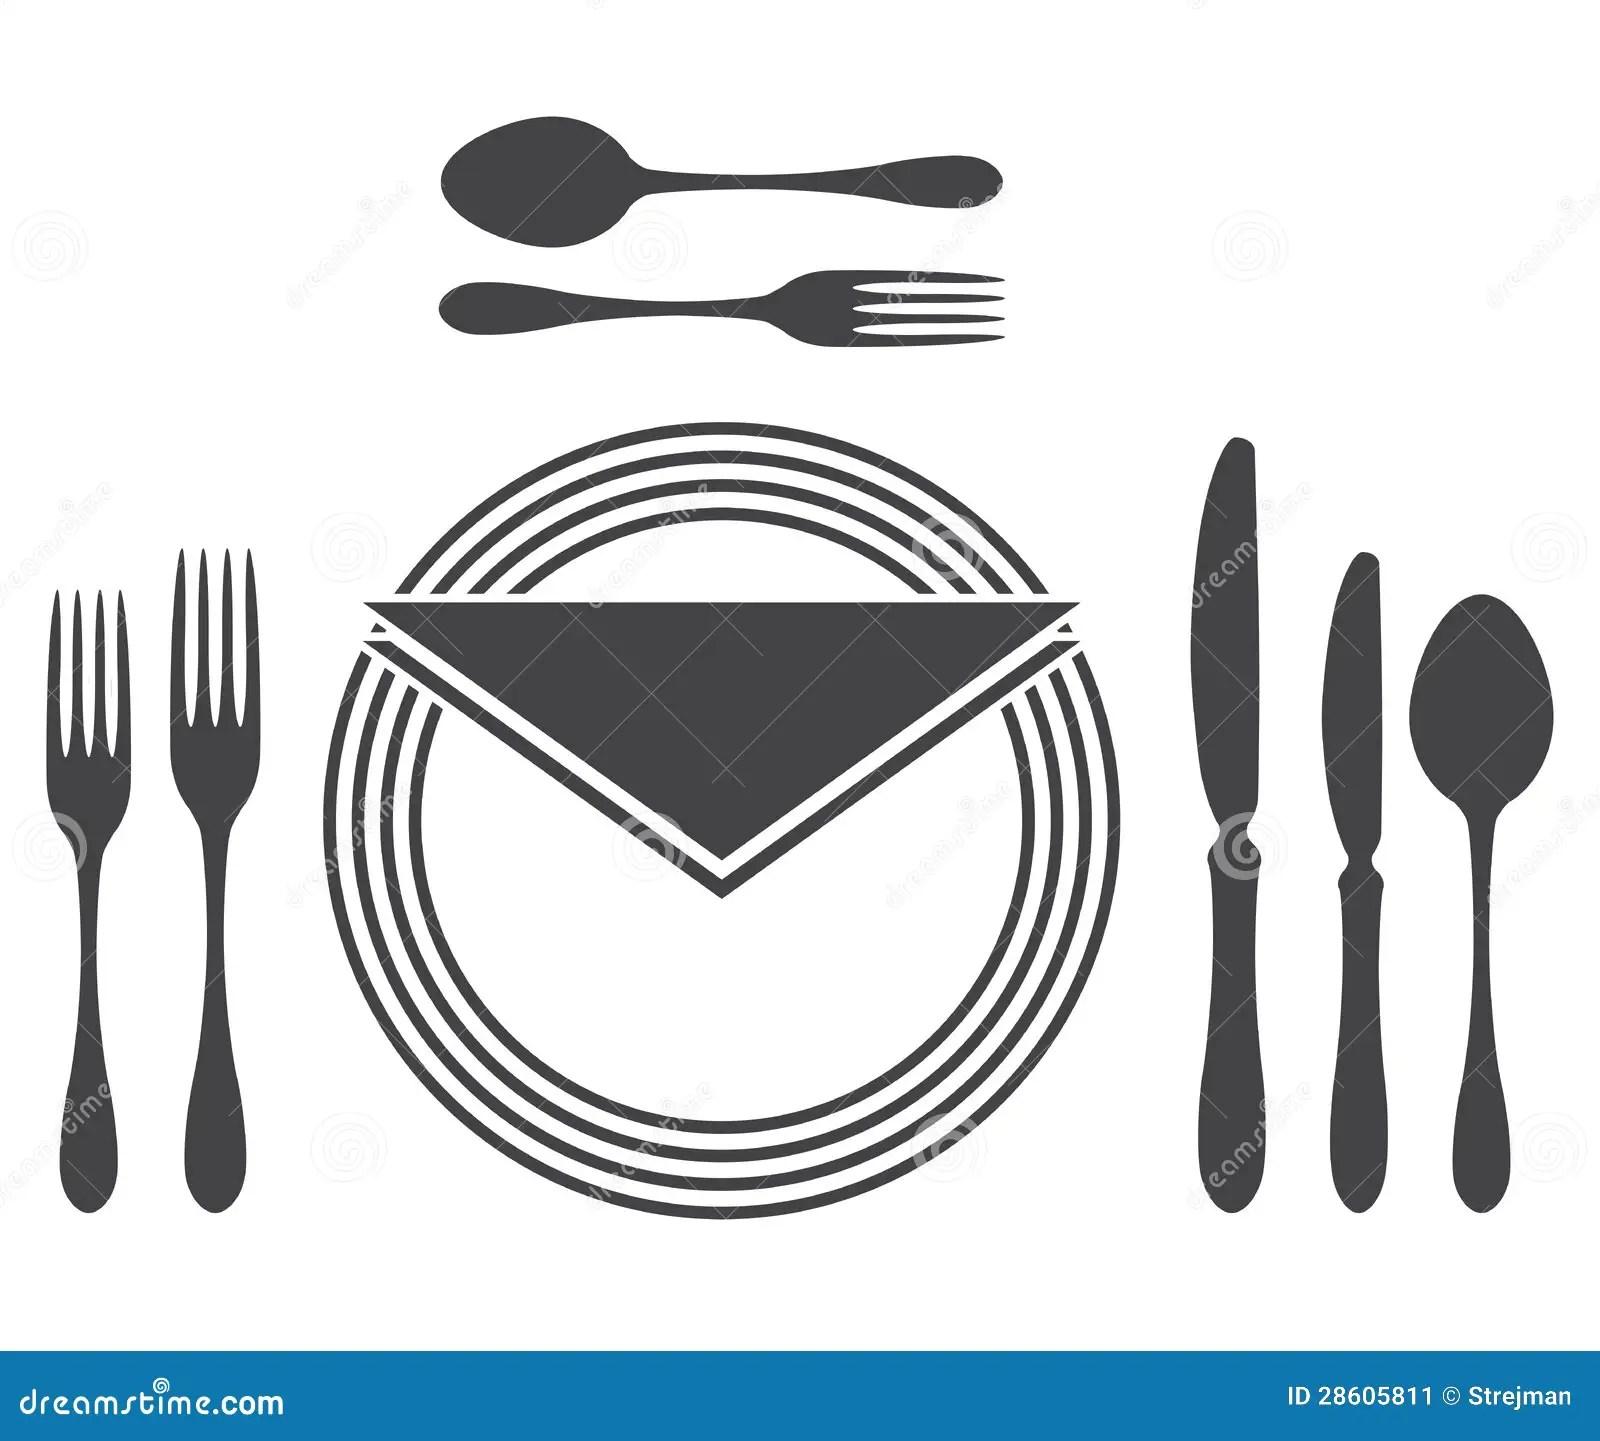 Etiquette Proper Table Setting Cartoon Vector